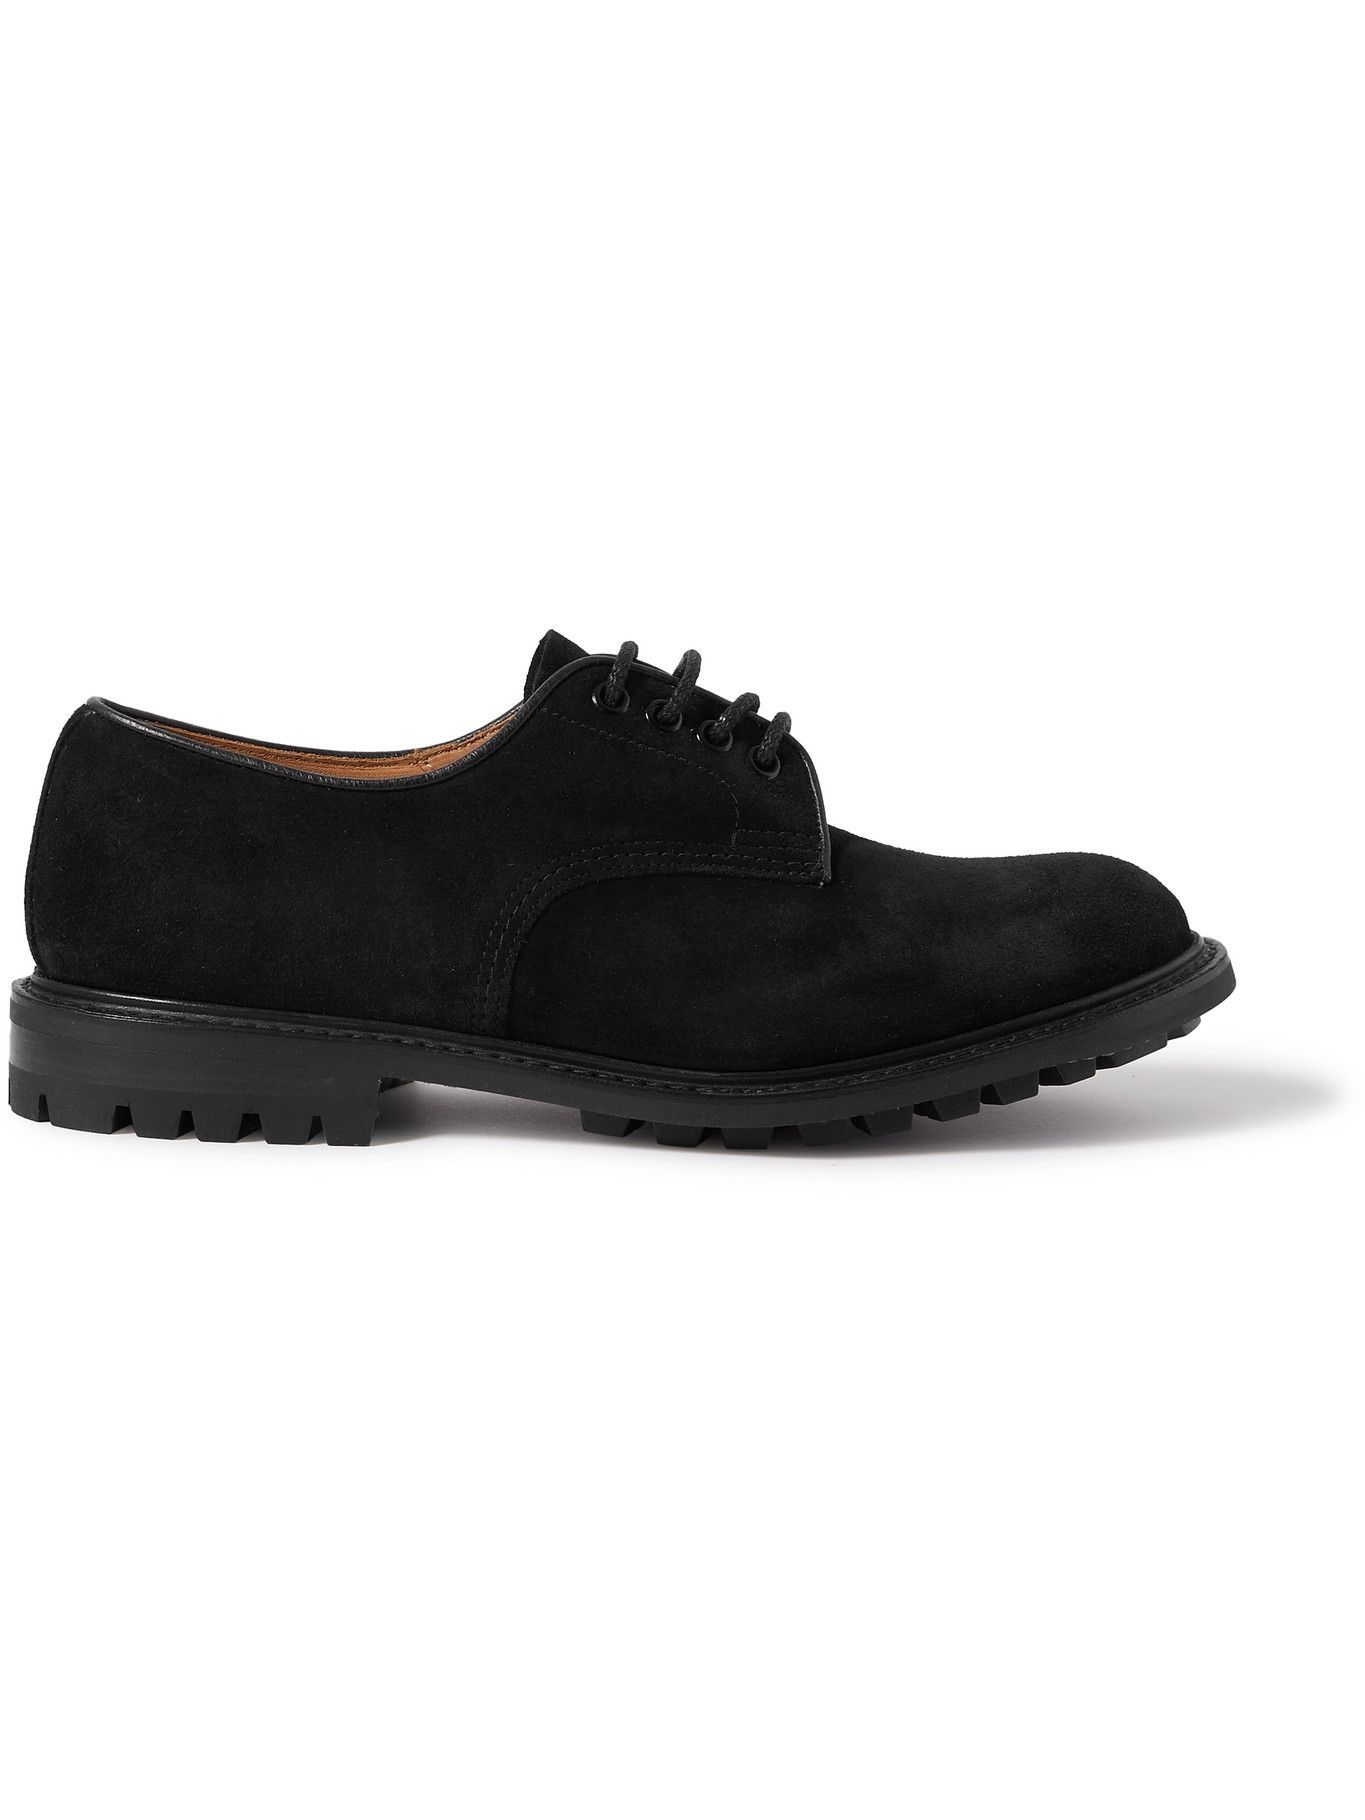 Photo: Tricker's - Daniel Leather-Trimmed Suede Derby Shoes - Black